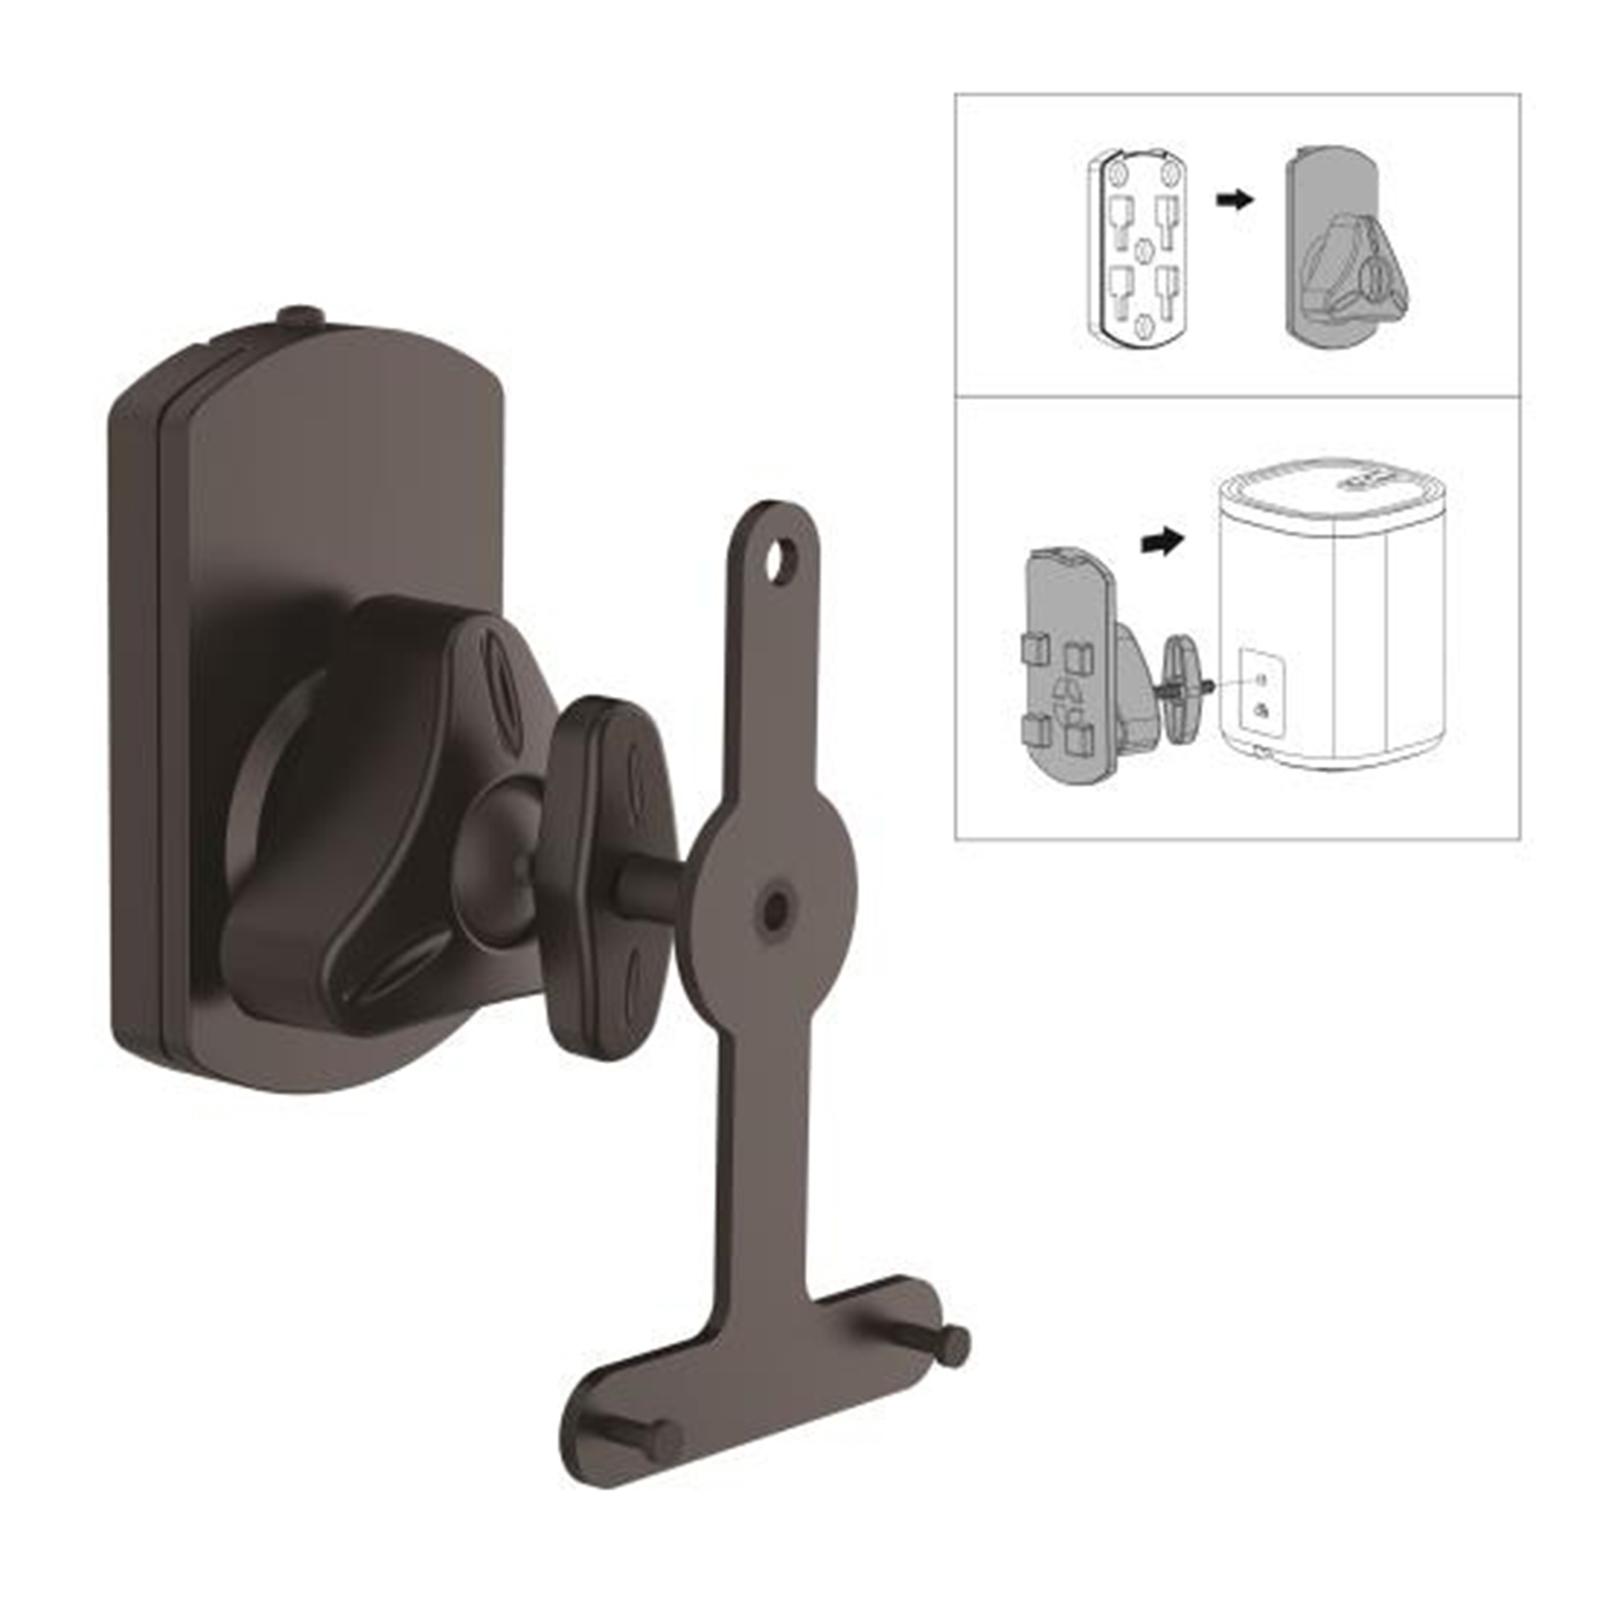 Pyle Dual Universal Wall Mount Speaker Stands, Tilt/Swive...